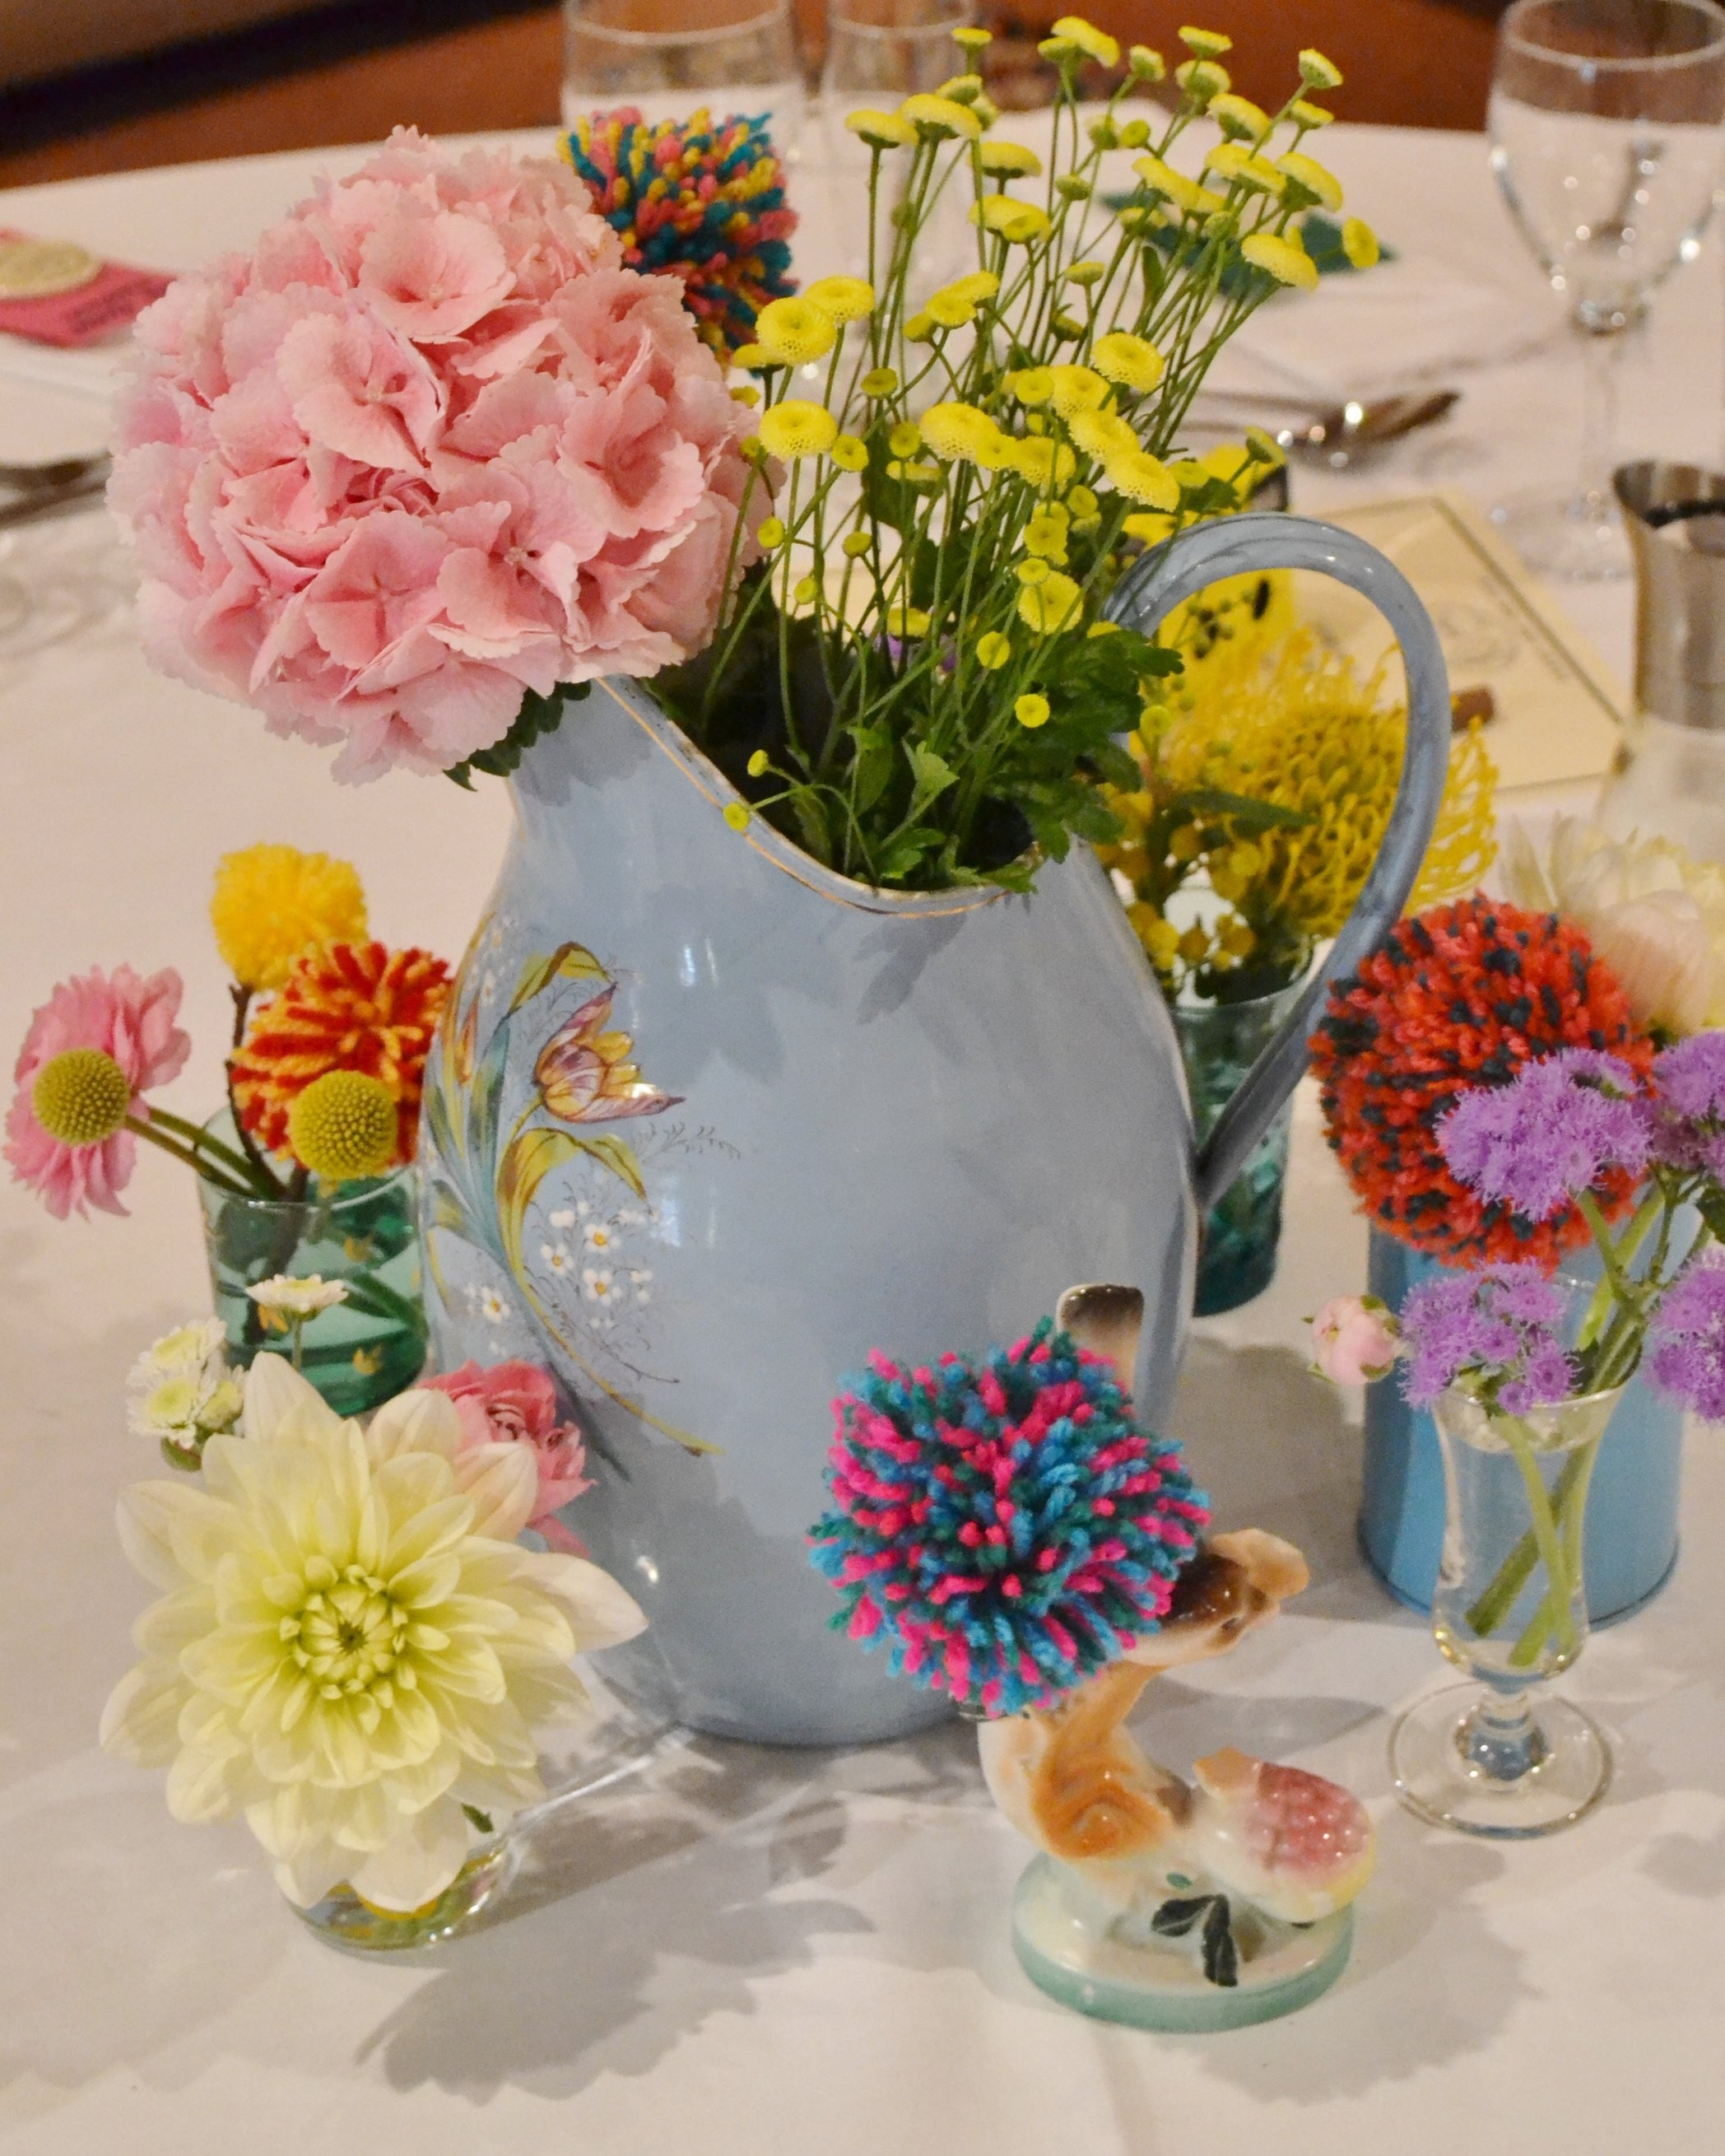 Webb-and-Farrer-Florist-Brighton-Sussex-Wedding-Flowers+%2813%29.jpg